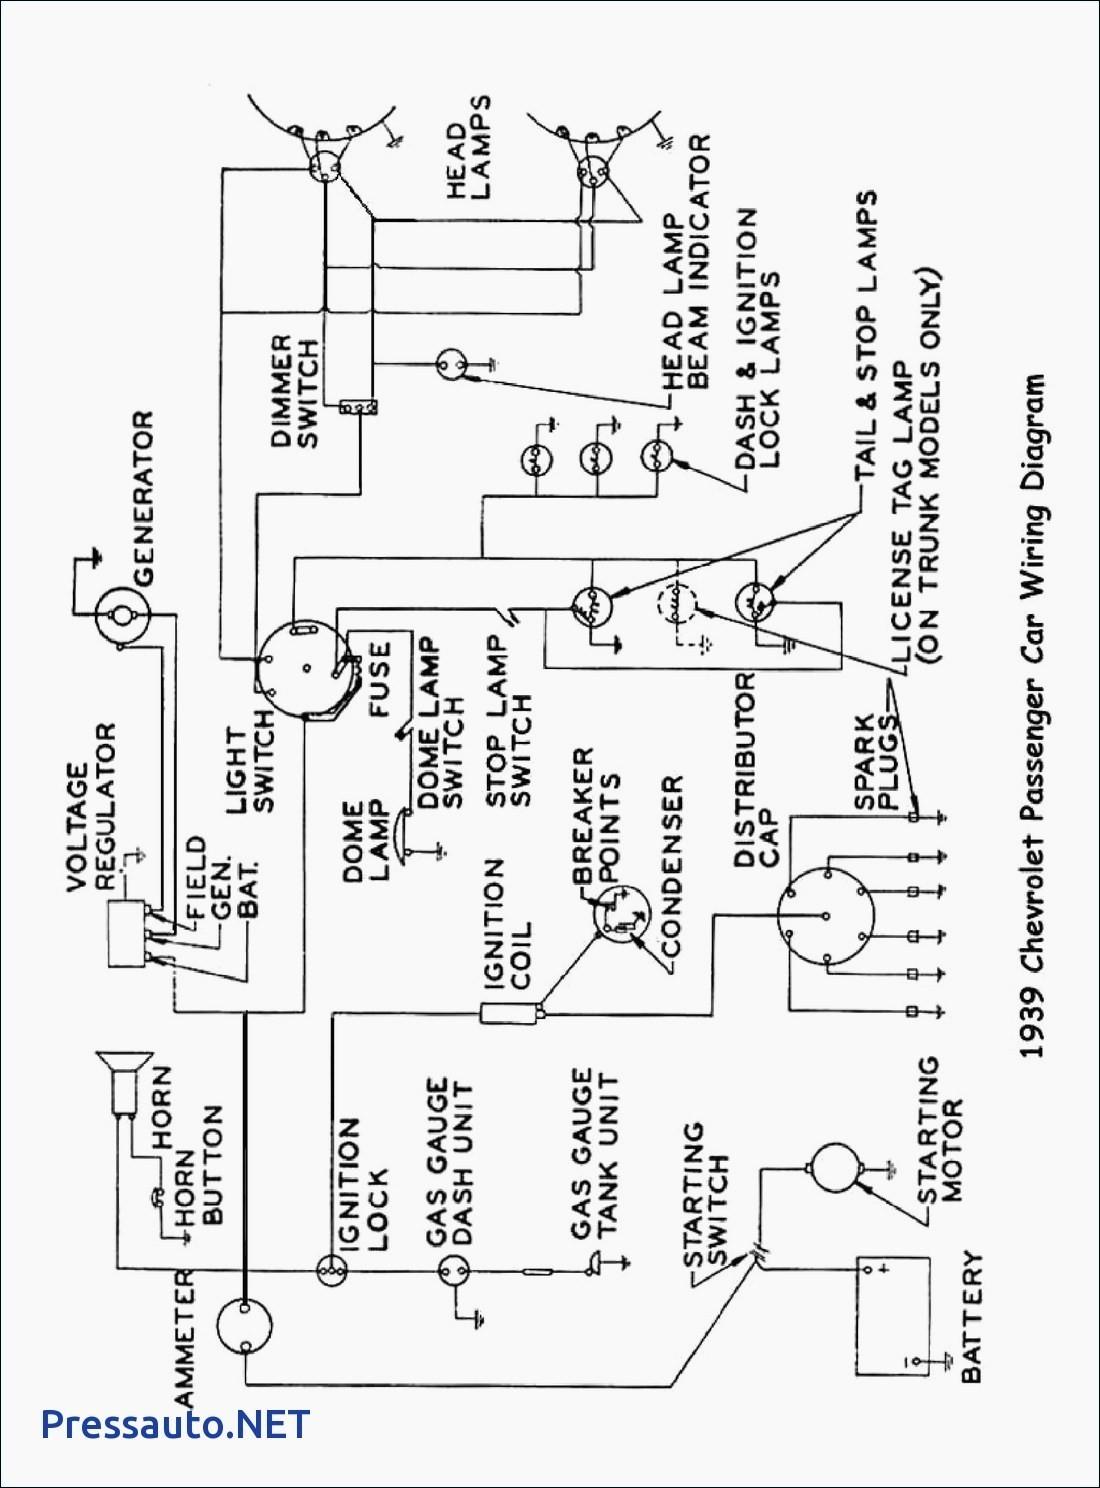 John Deere F925 Wiring Diagram